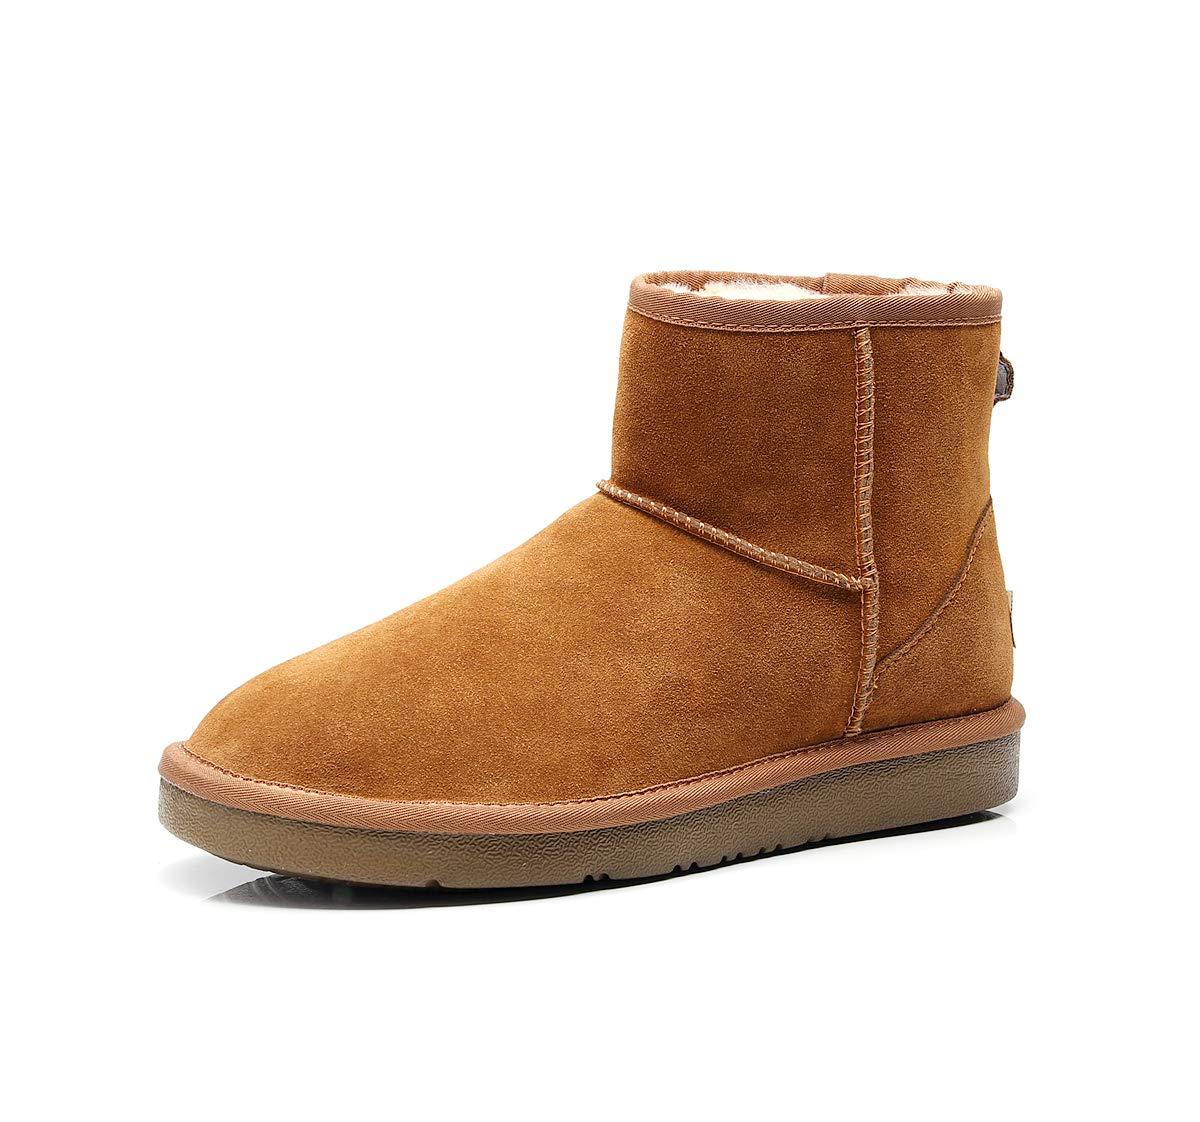 2334cd5f95c Premium Australian Sheepskin, Classic,Ankle UGG Boot, Water ...